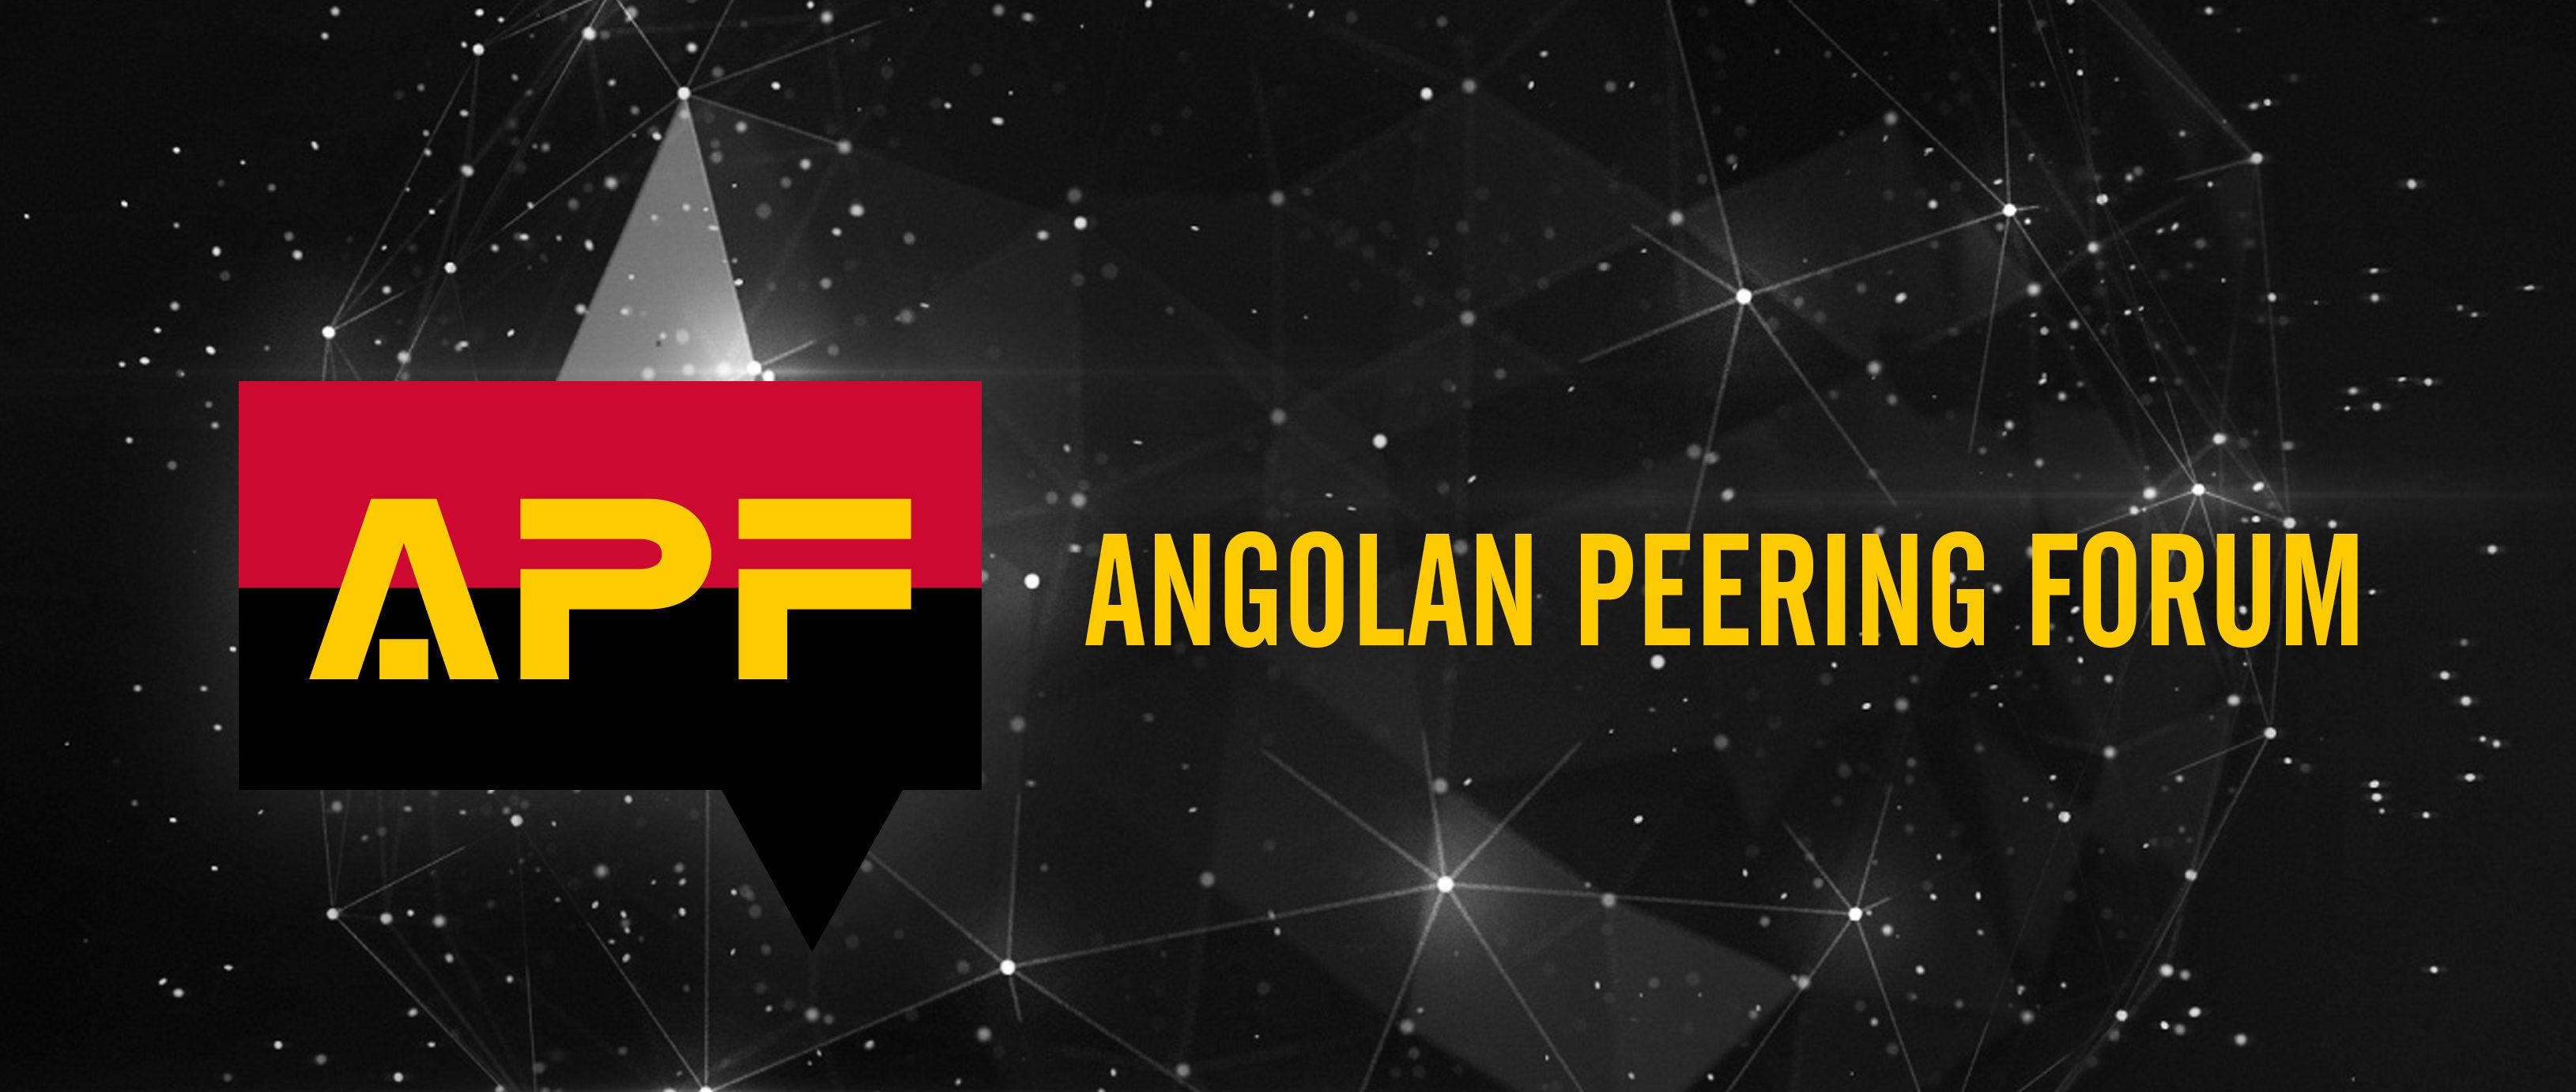 Angola Peering Forum